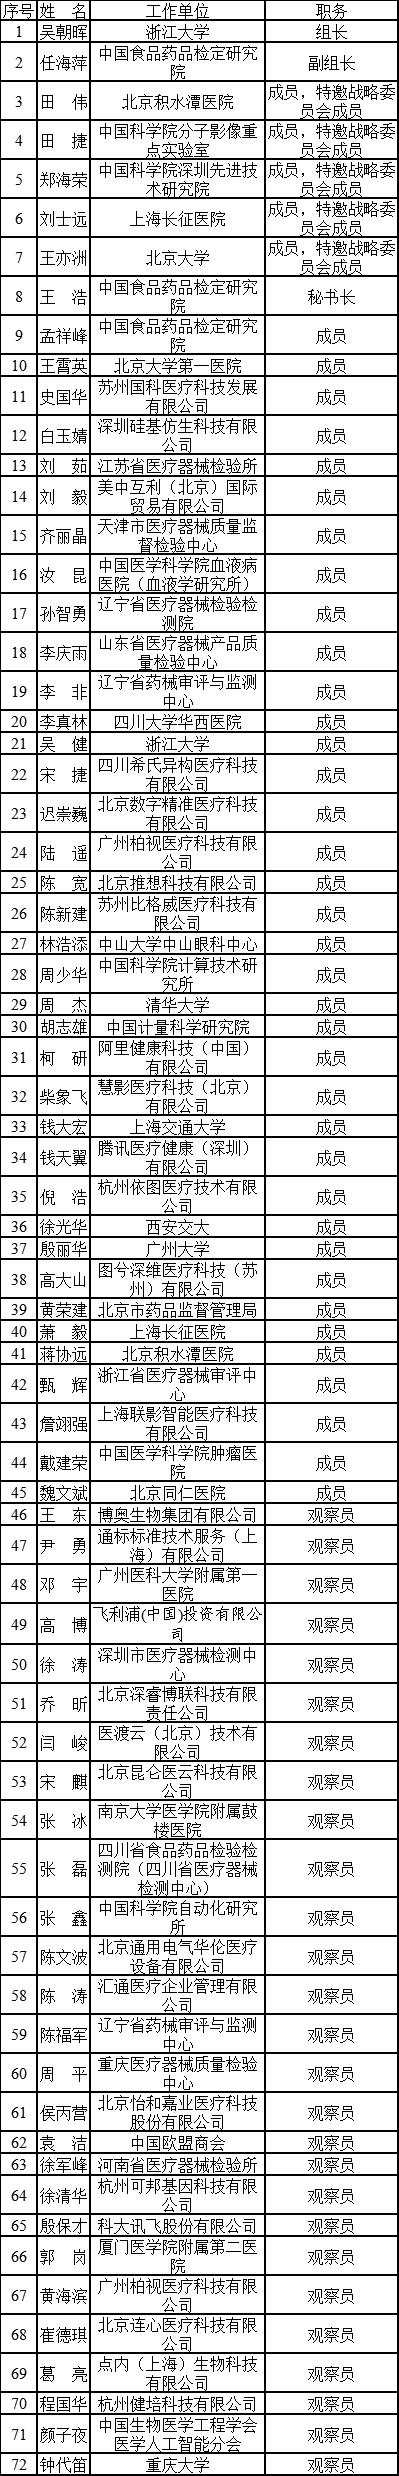 Name list3